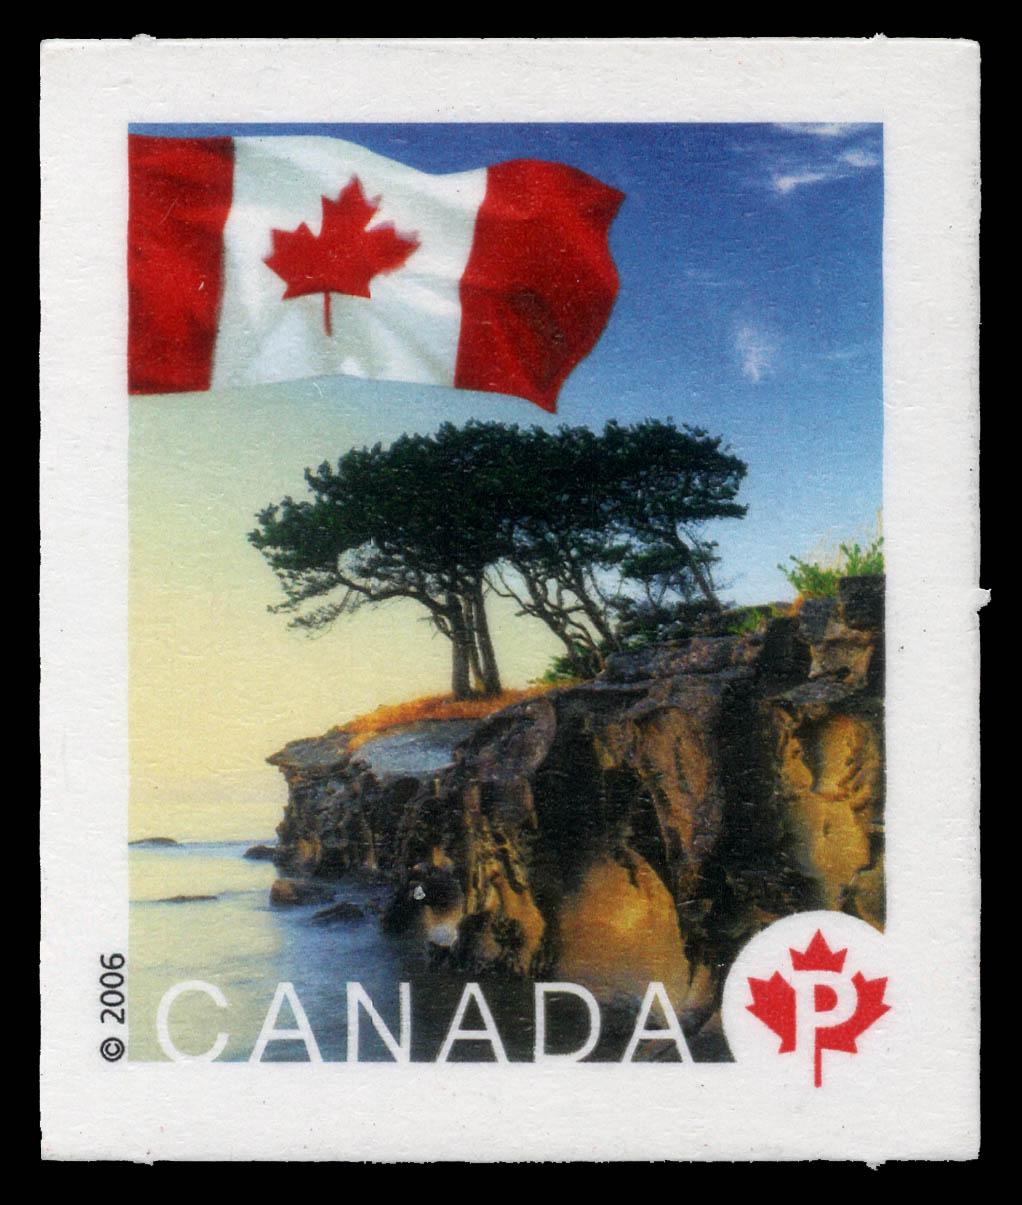 A coastline view in Chemainus, British Columbia Canada Postage Stamp   Flag